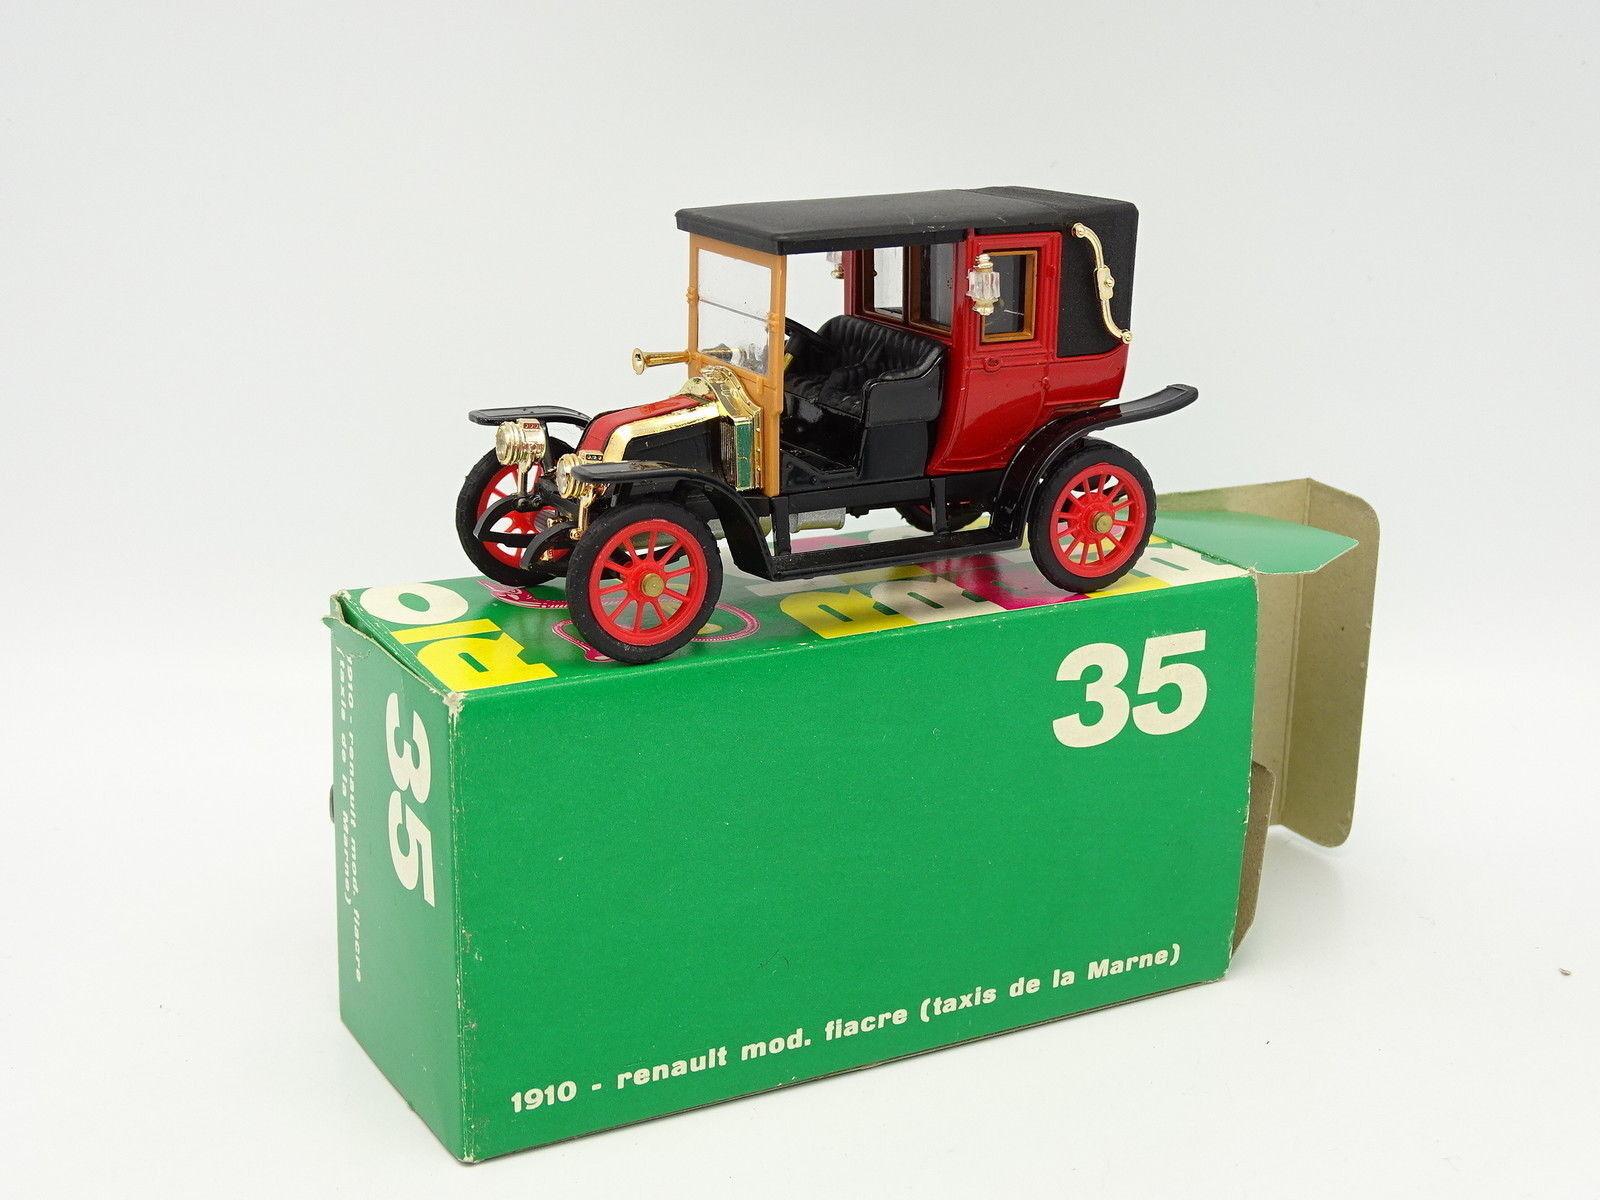 Rio 1 43 - Renault Fiacre Taxi de la Marne 1910 35